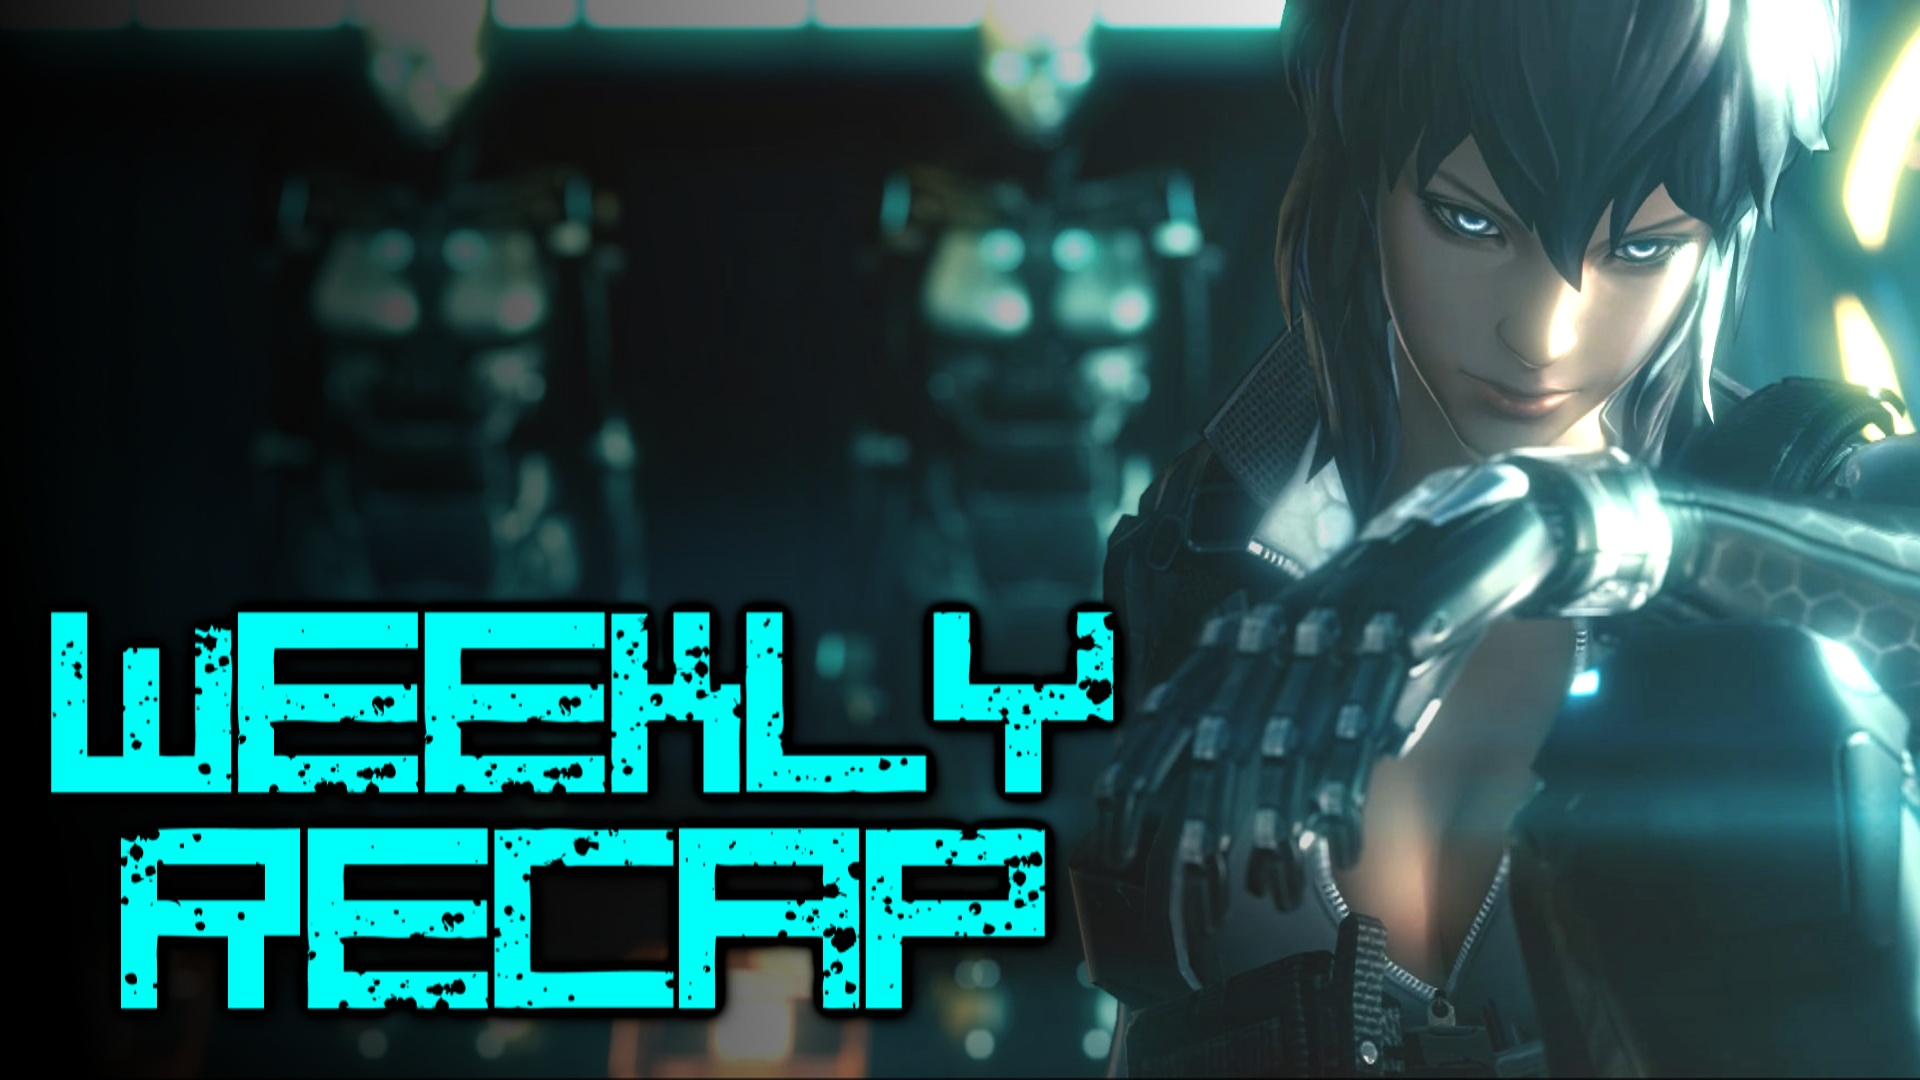 MMOHuts Weekly Recap #257 Sept. 21st - First Assault, ELOA, DarkScape & More!